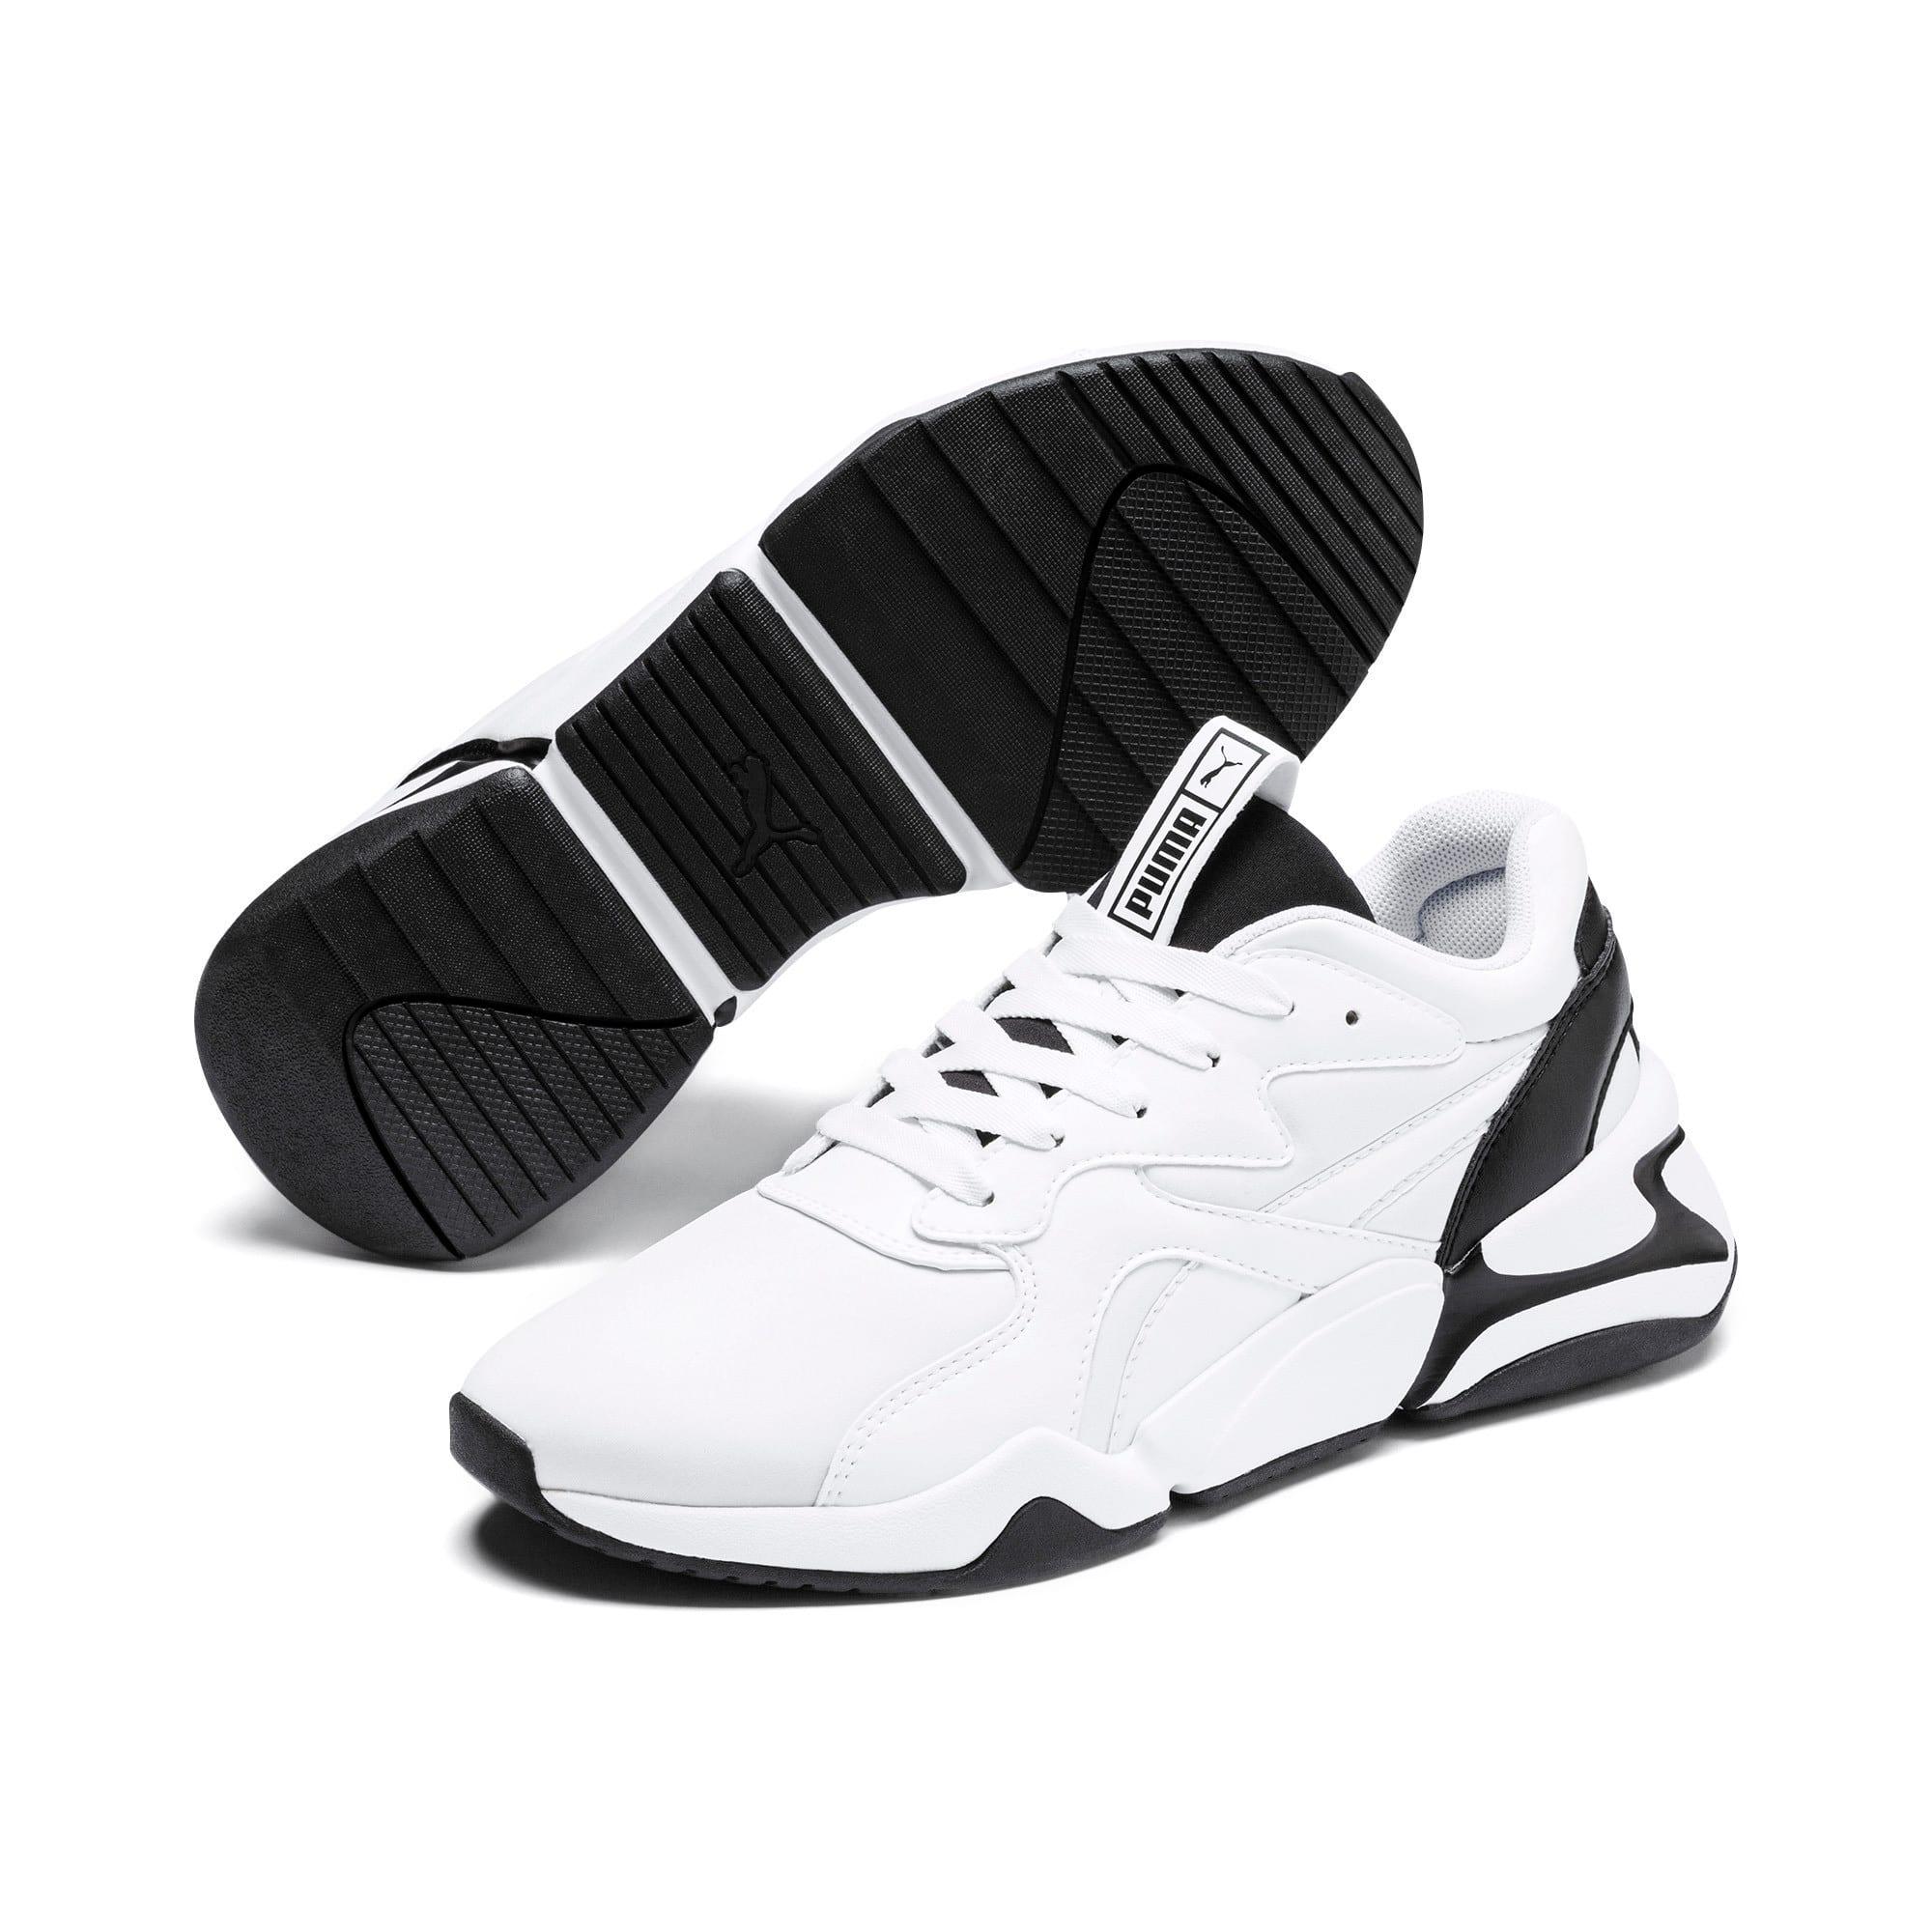 Thumbnail 3 of Nova Women's Sneakers, Puma White-Puma Black, medium